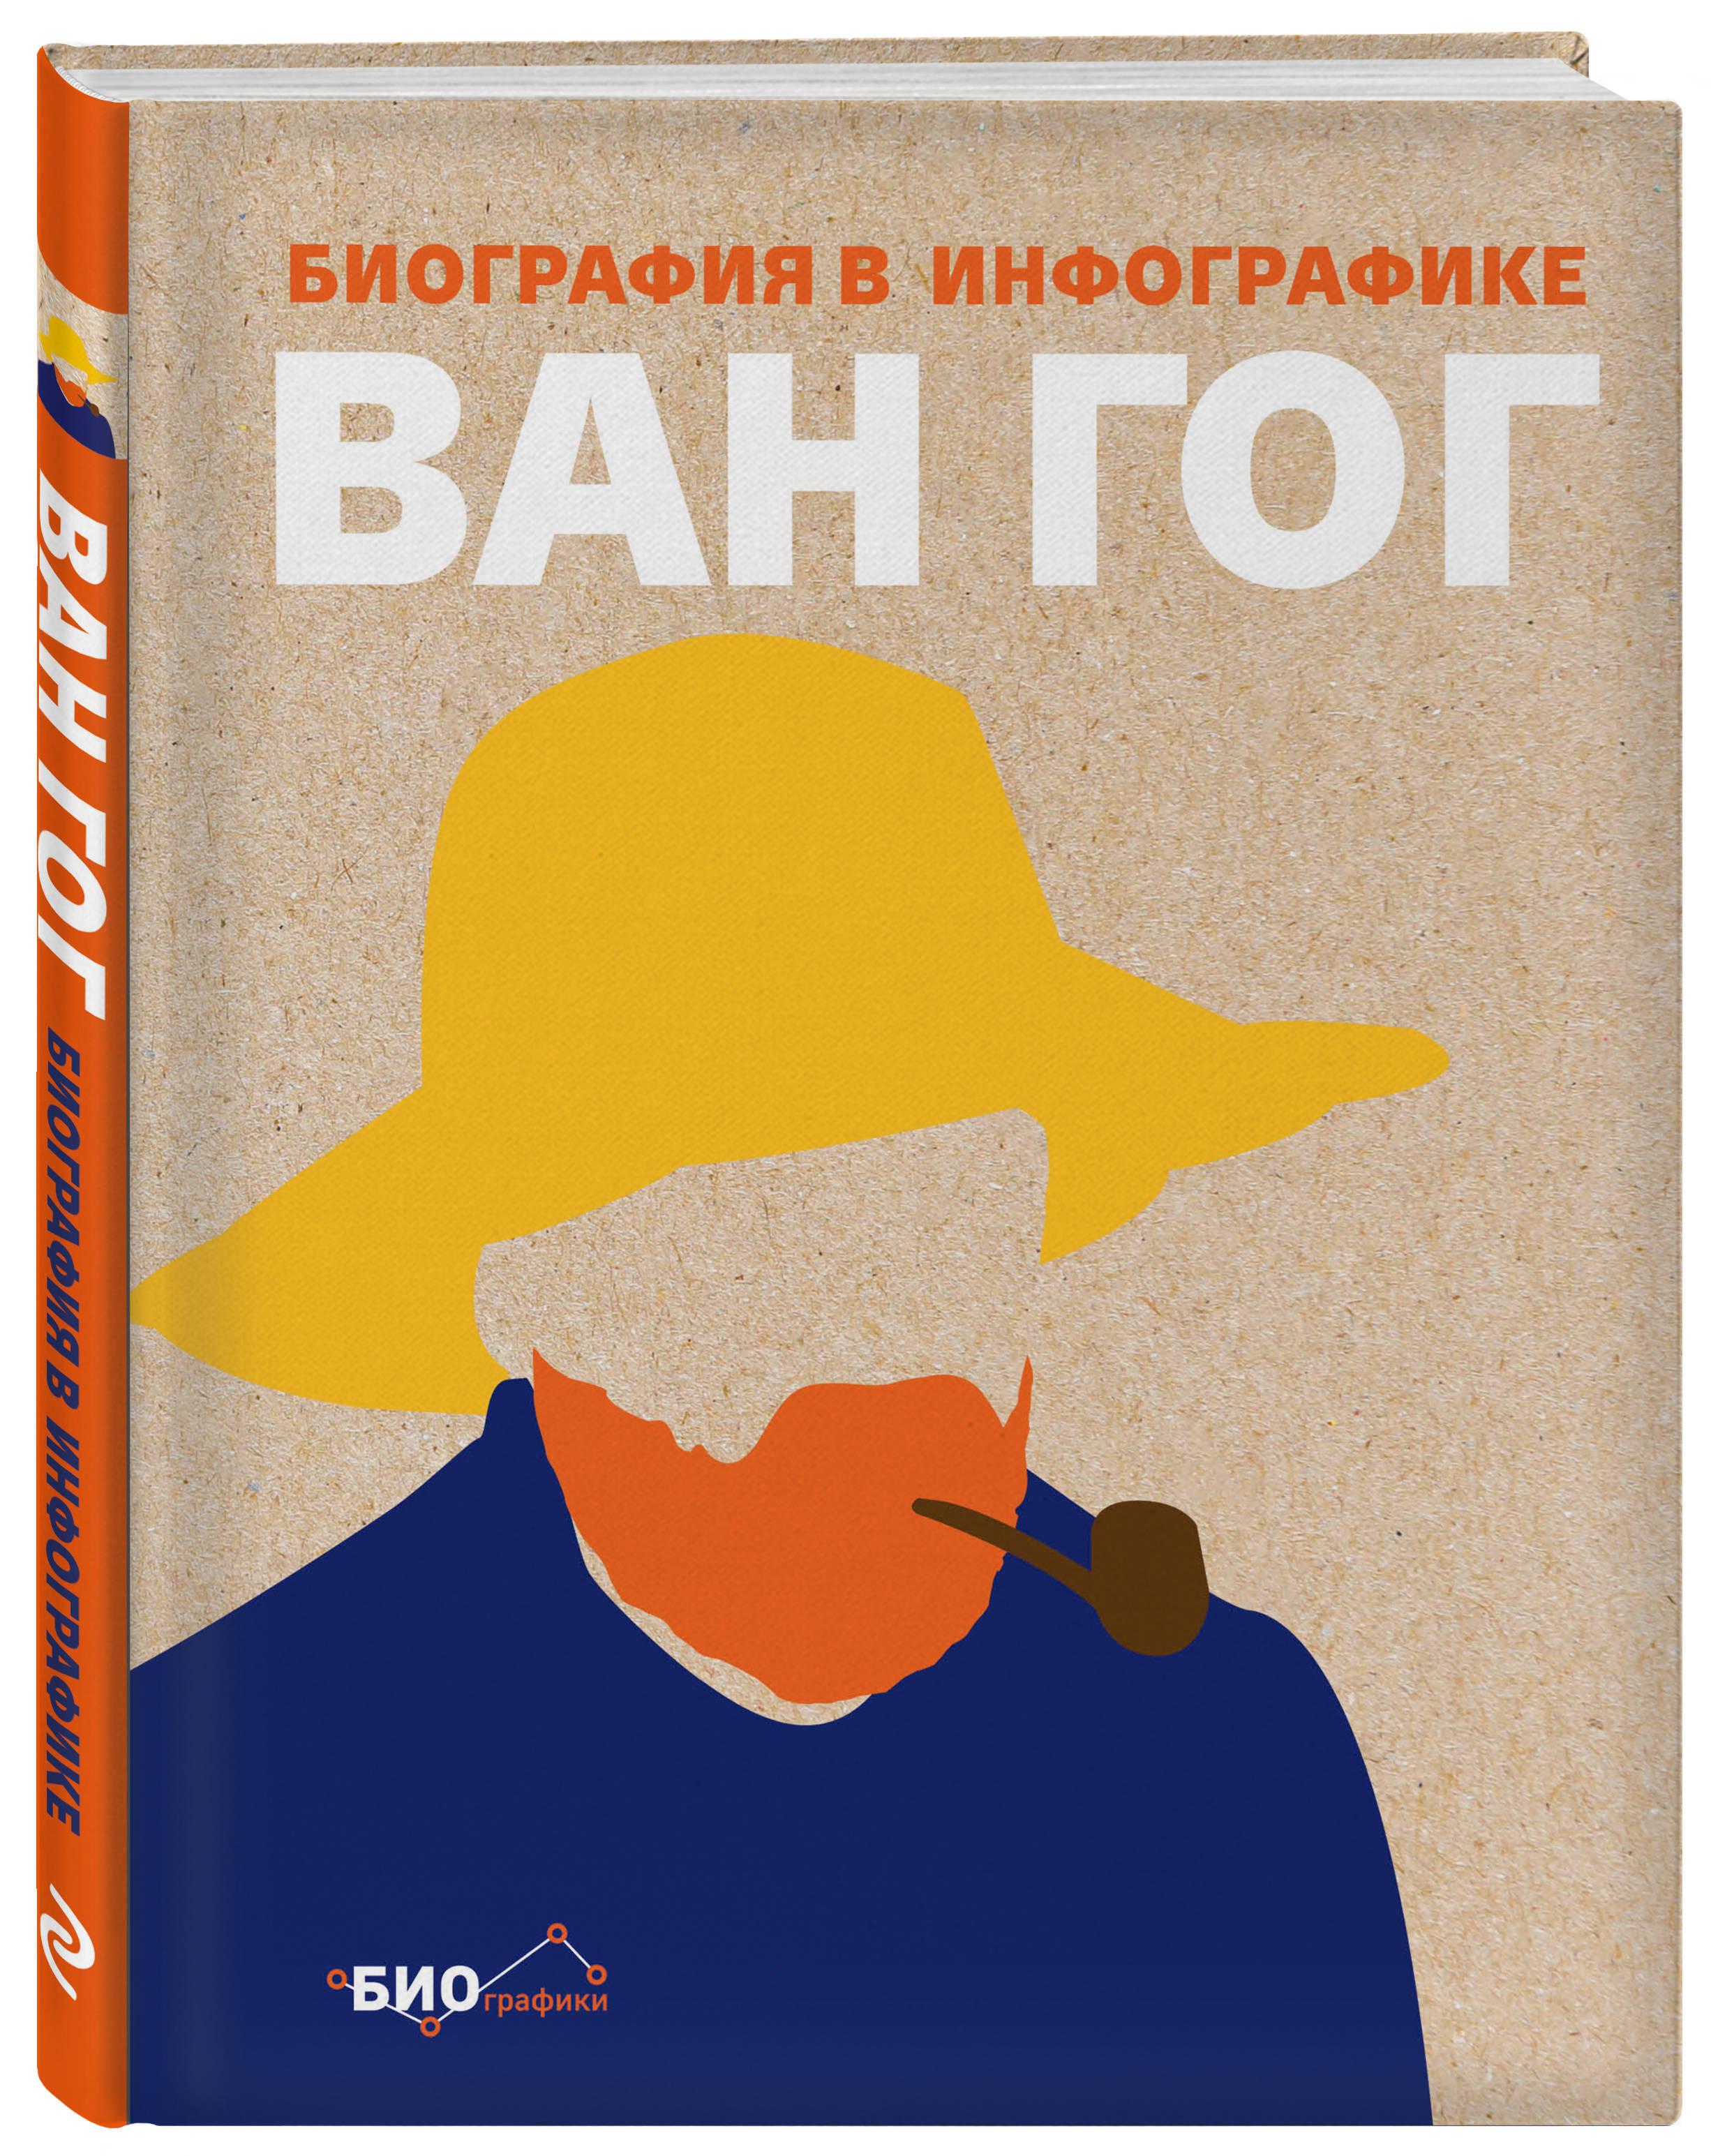 Ван Гог. Биография в инфографике футболка print bar ван гог